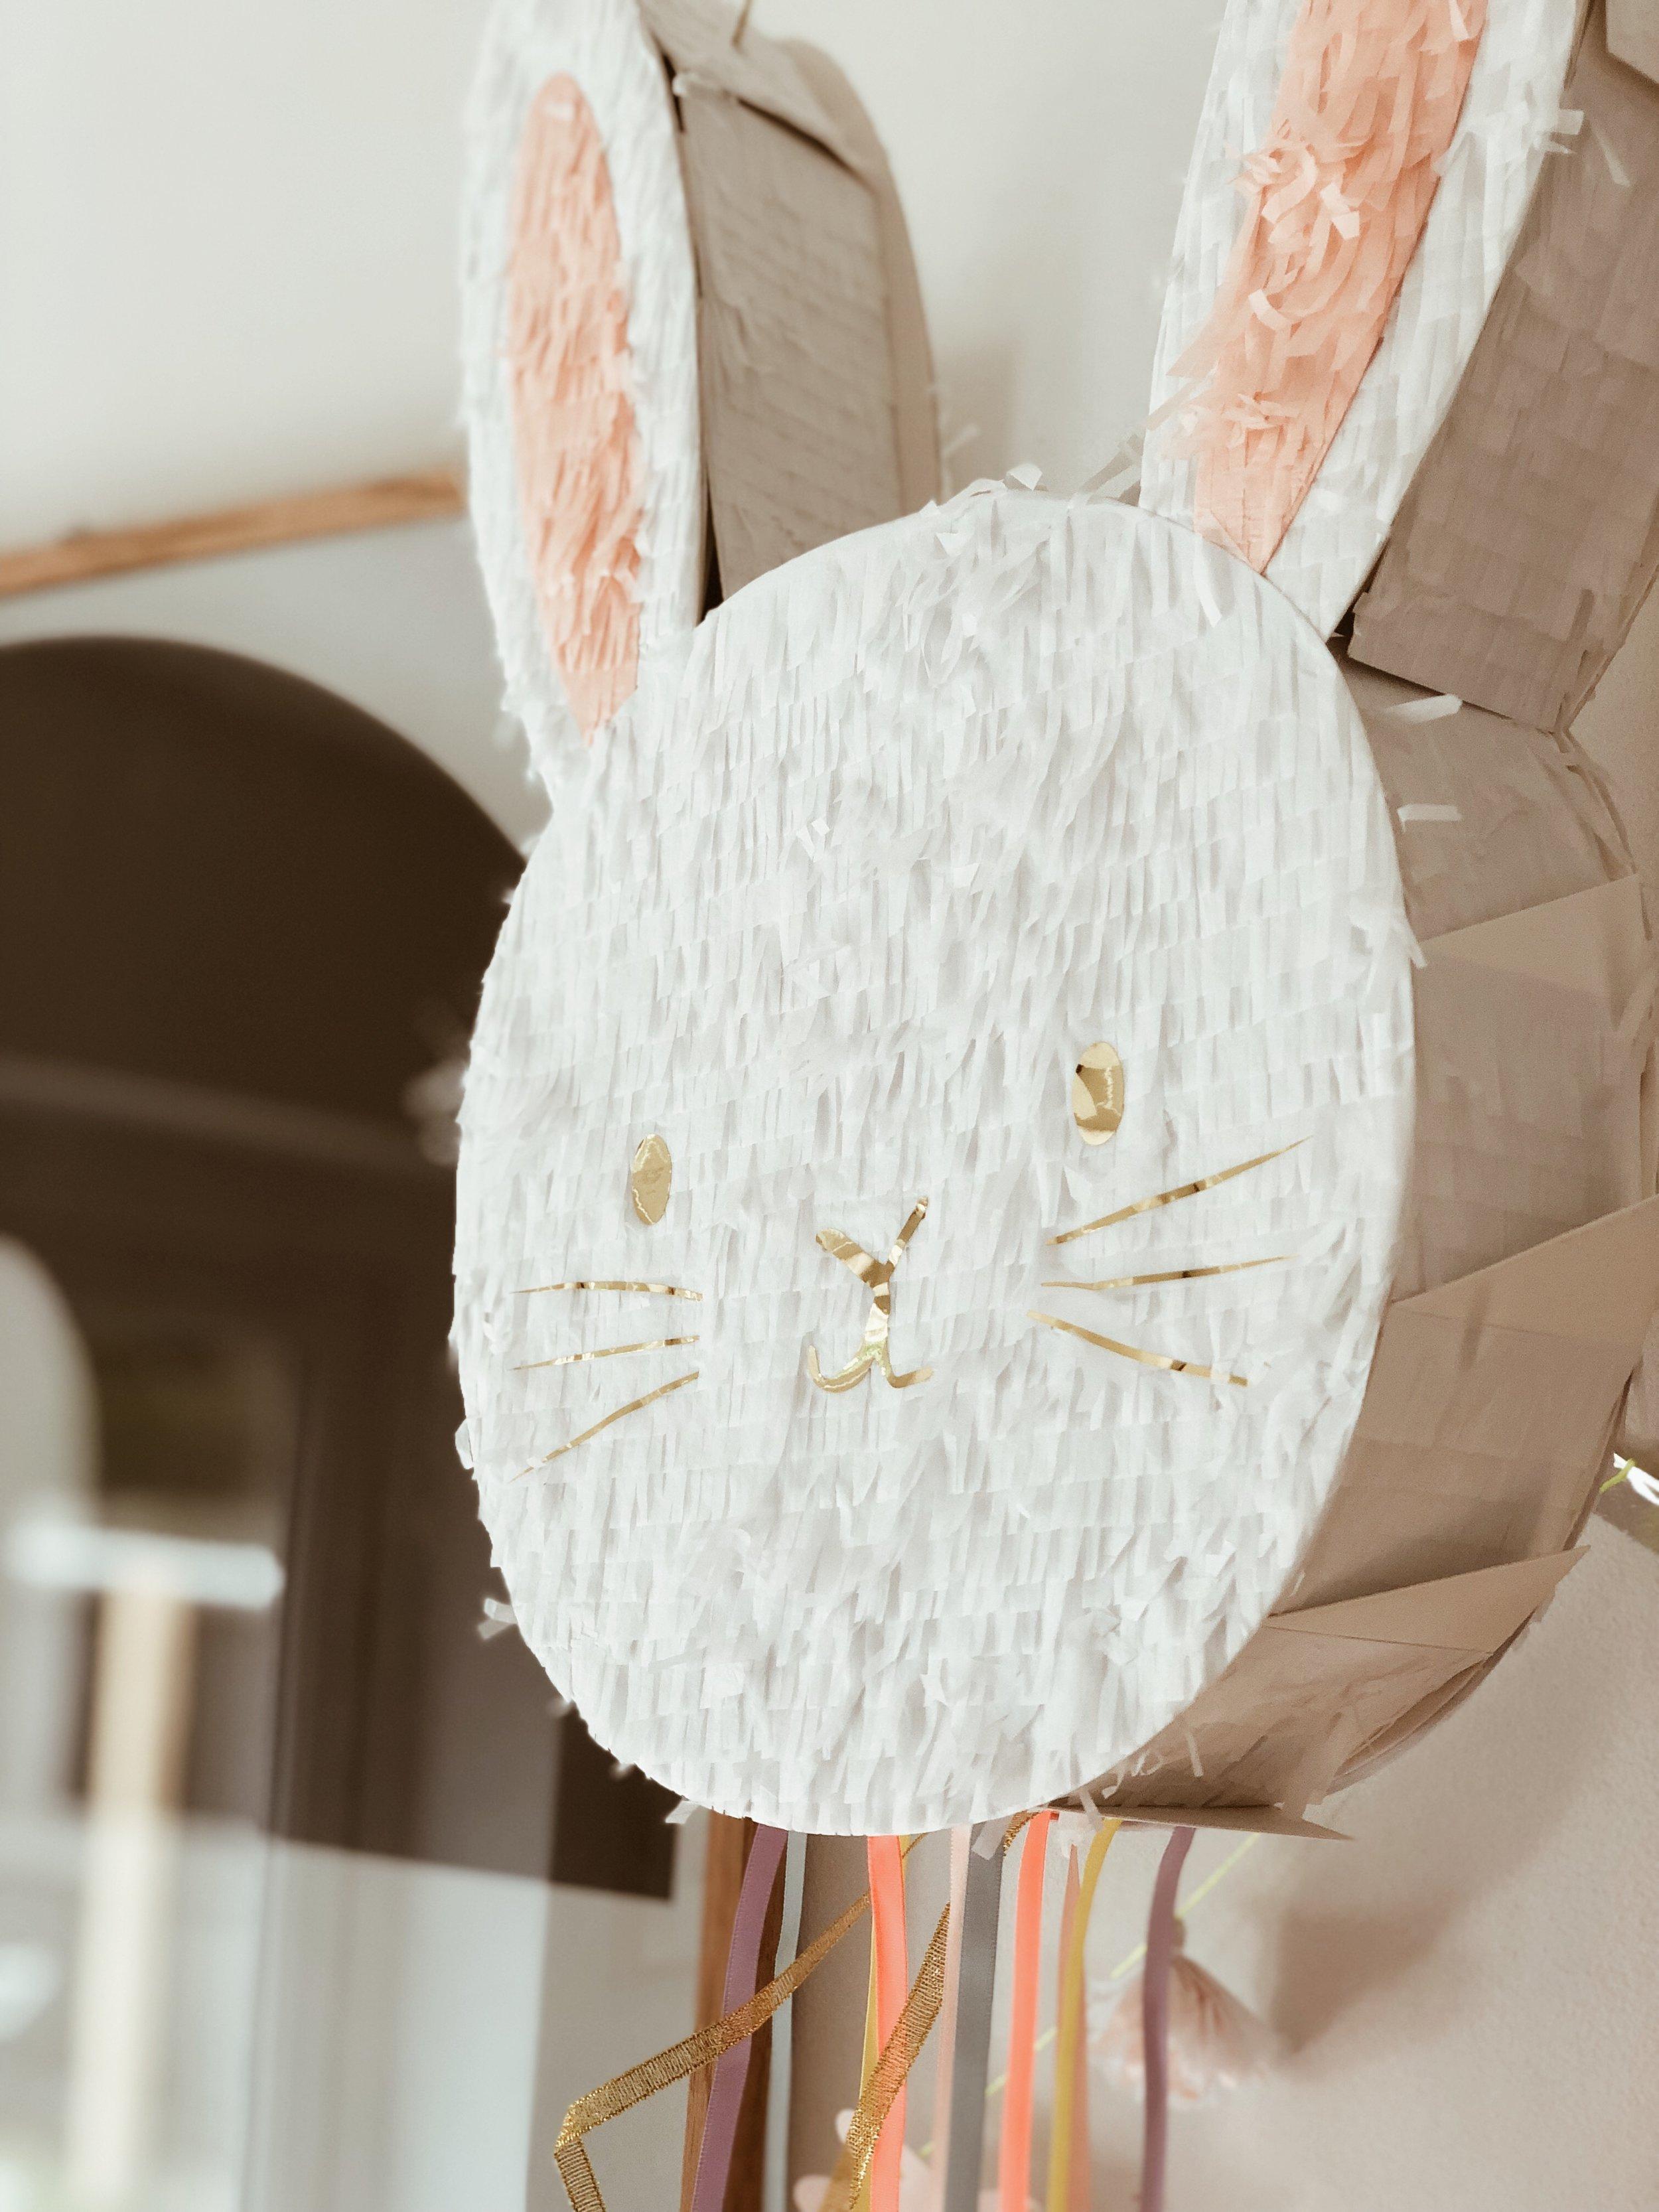 The amazing bunny pinata